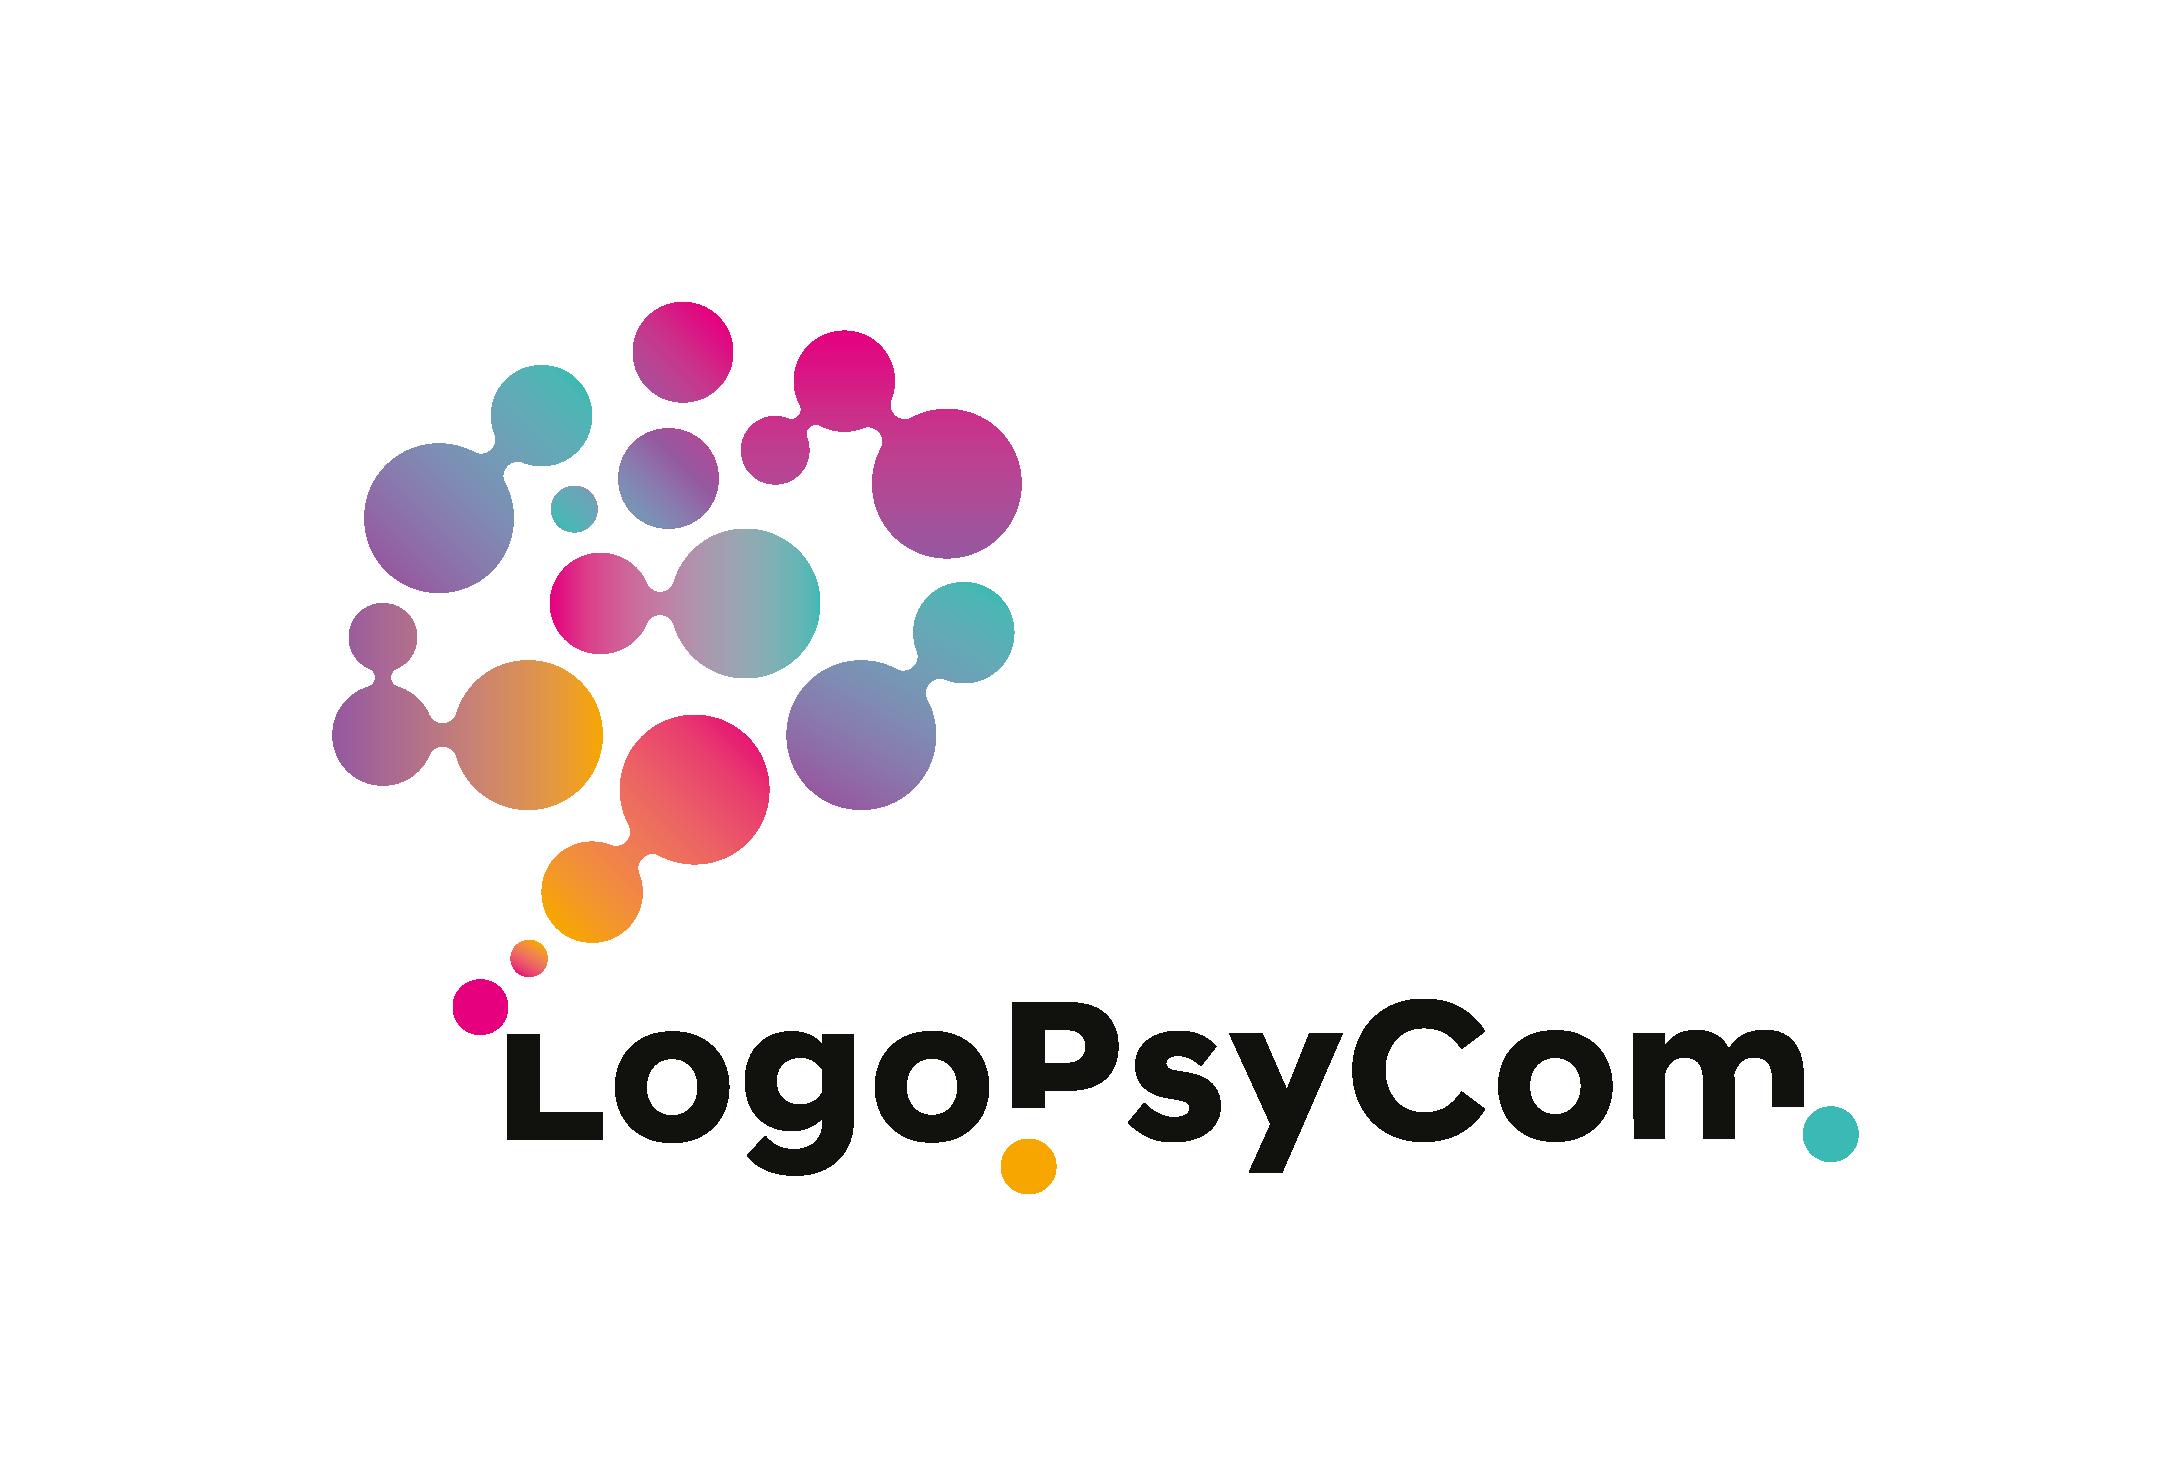 LogoPsycom logo